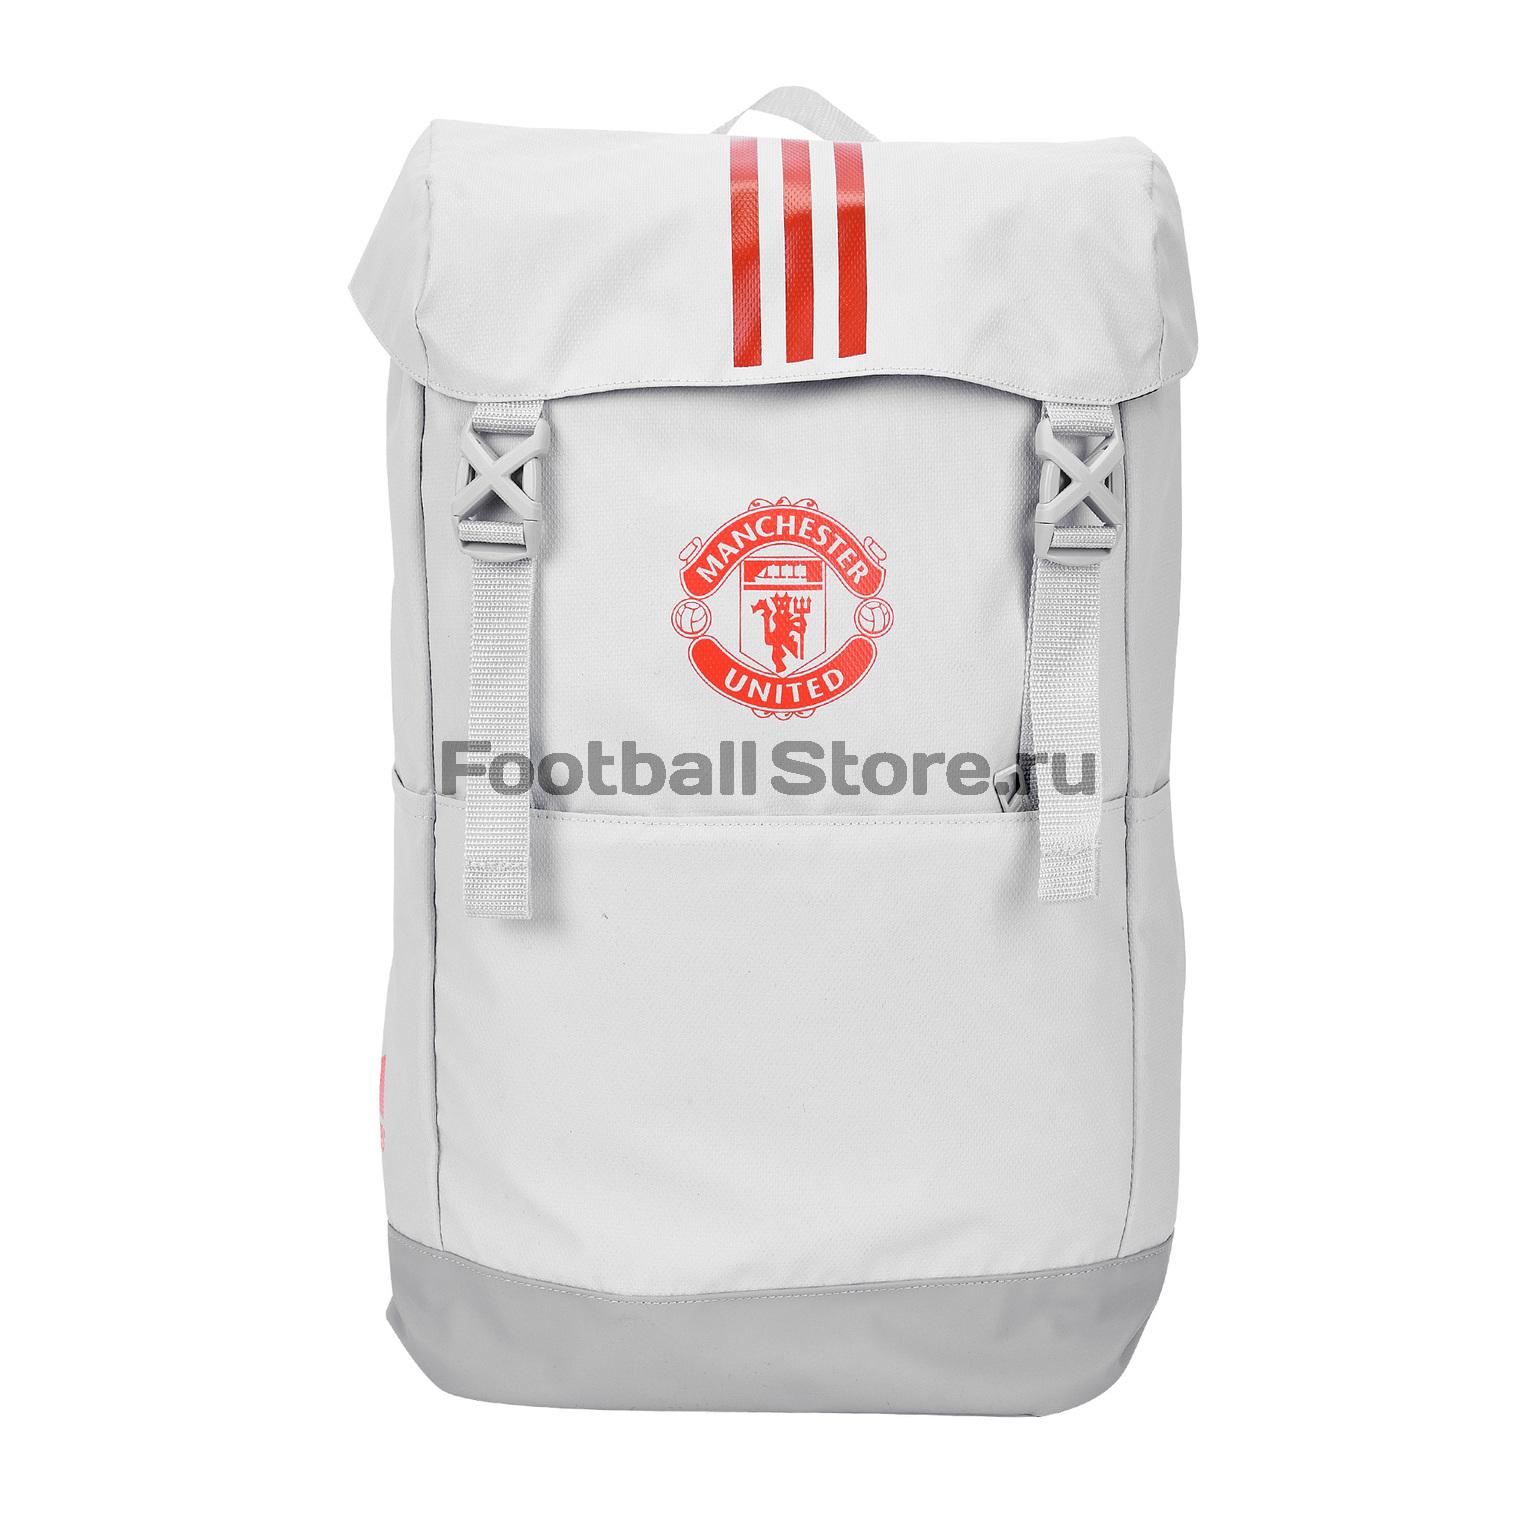 Рюкзак Adidas Manchester United DQ1525 рюкзак adidas manchester united cy5581